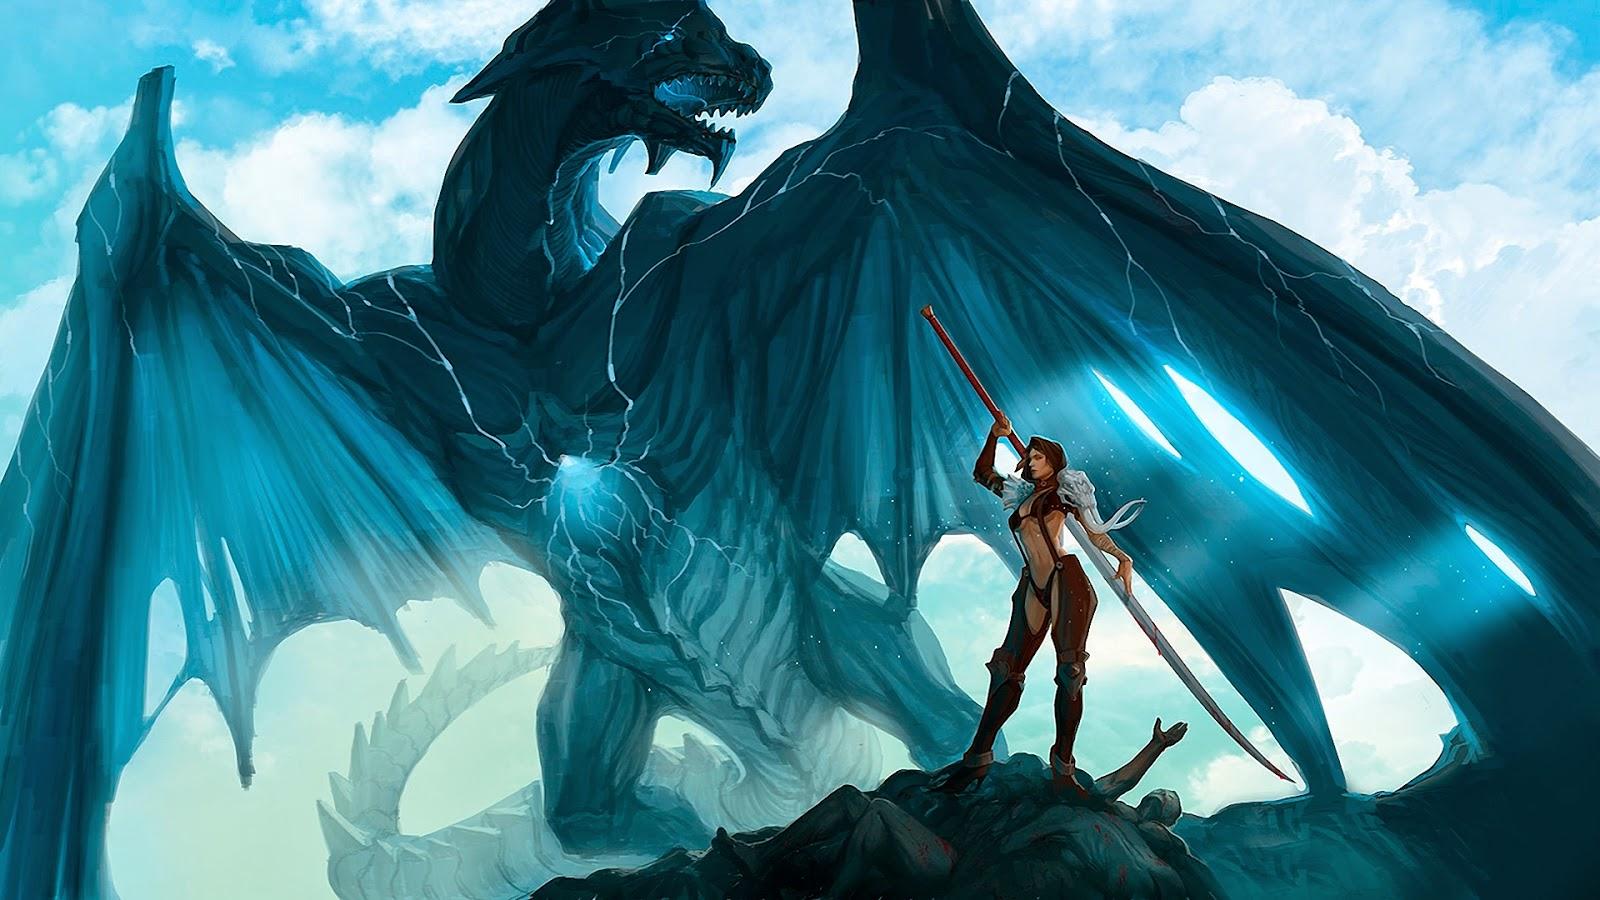 Giant Dragon Beast HD Wallpaper - Free Wallpaper HD